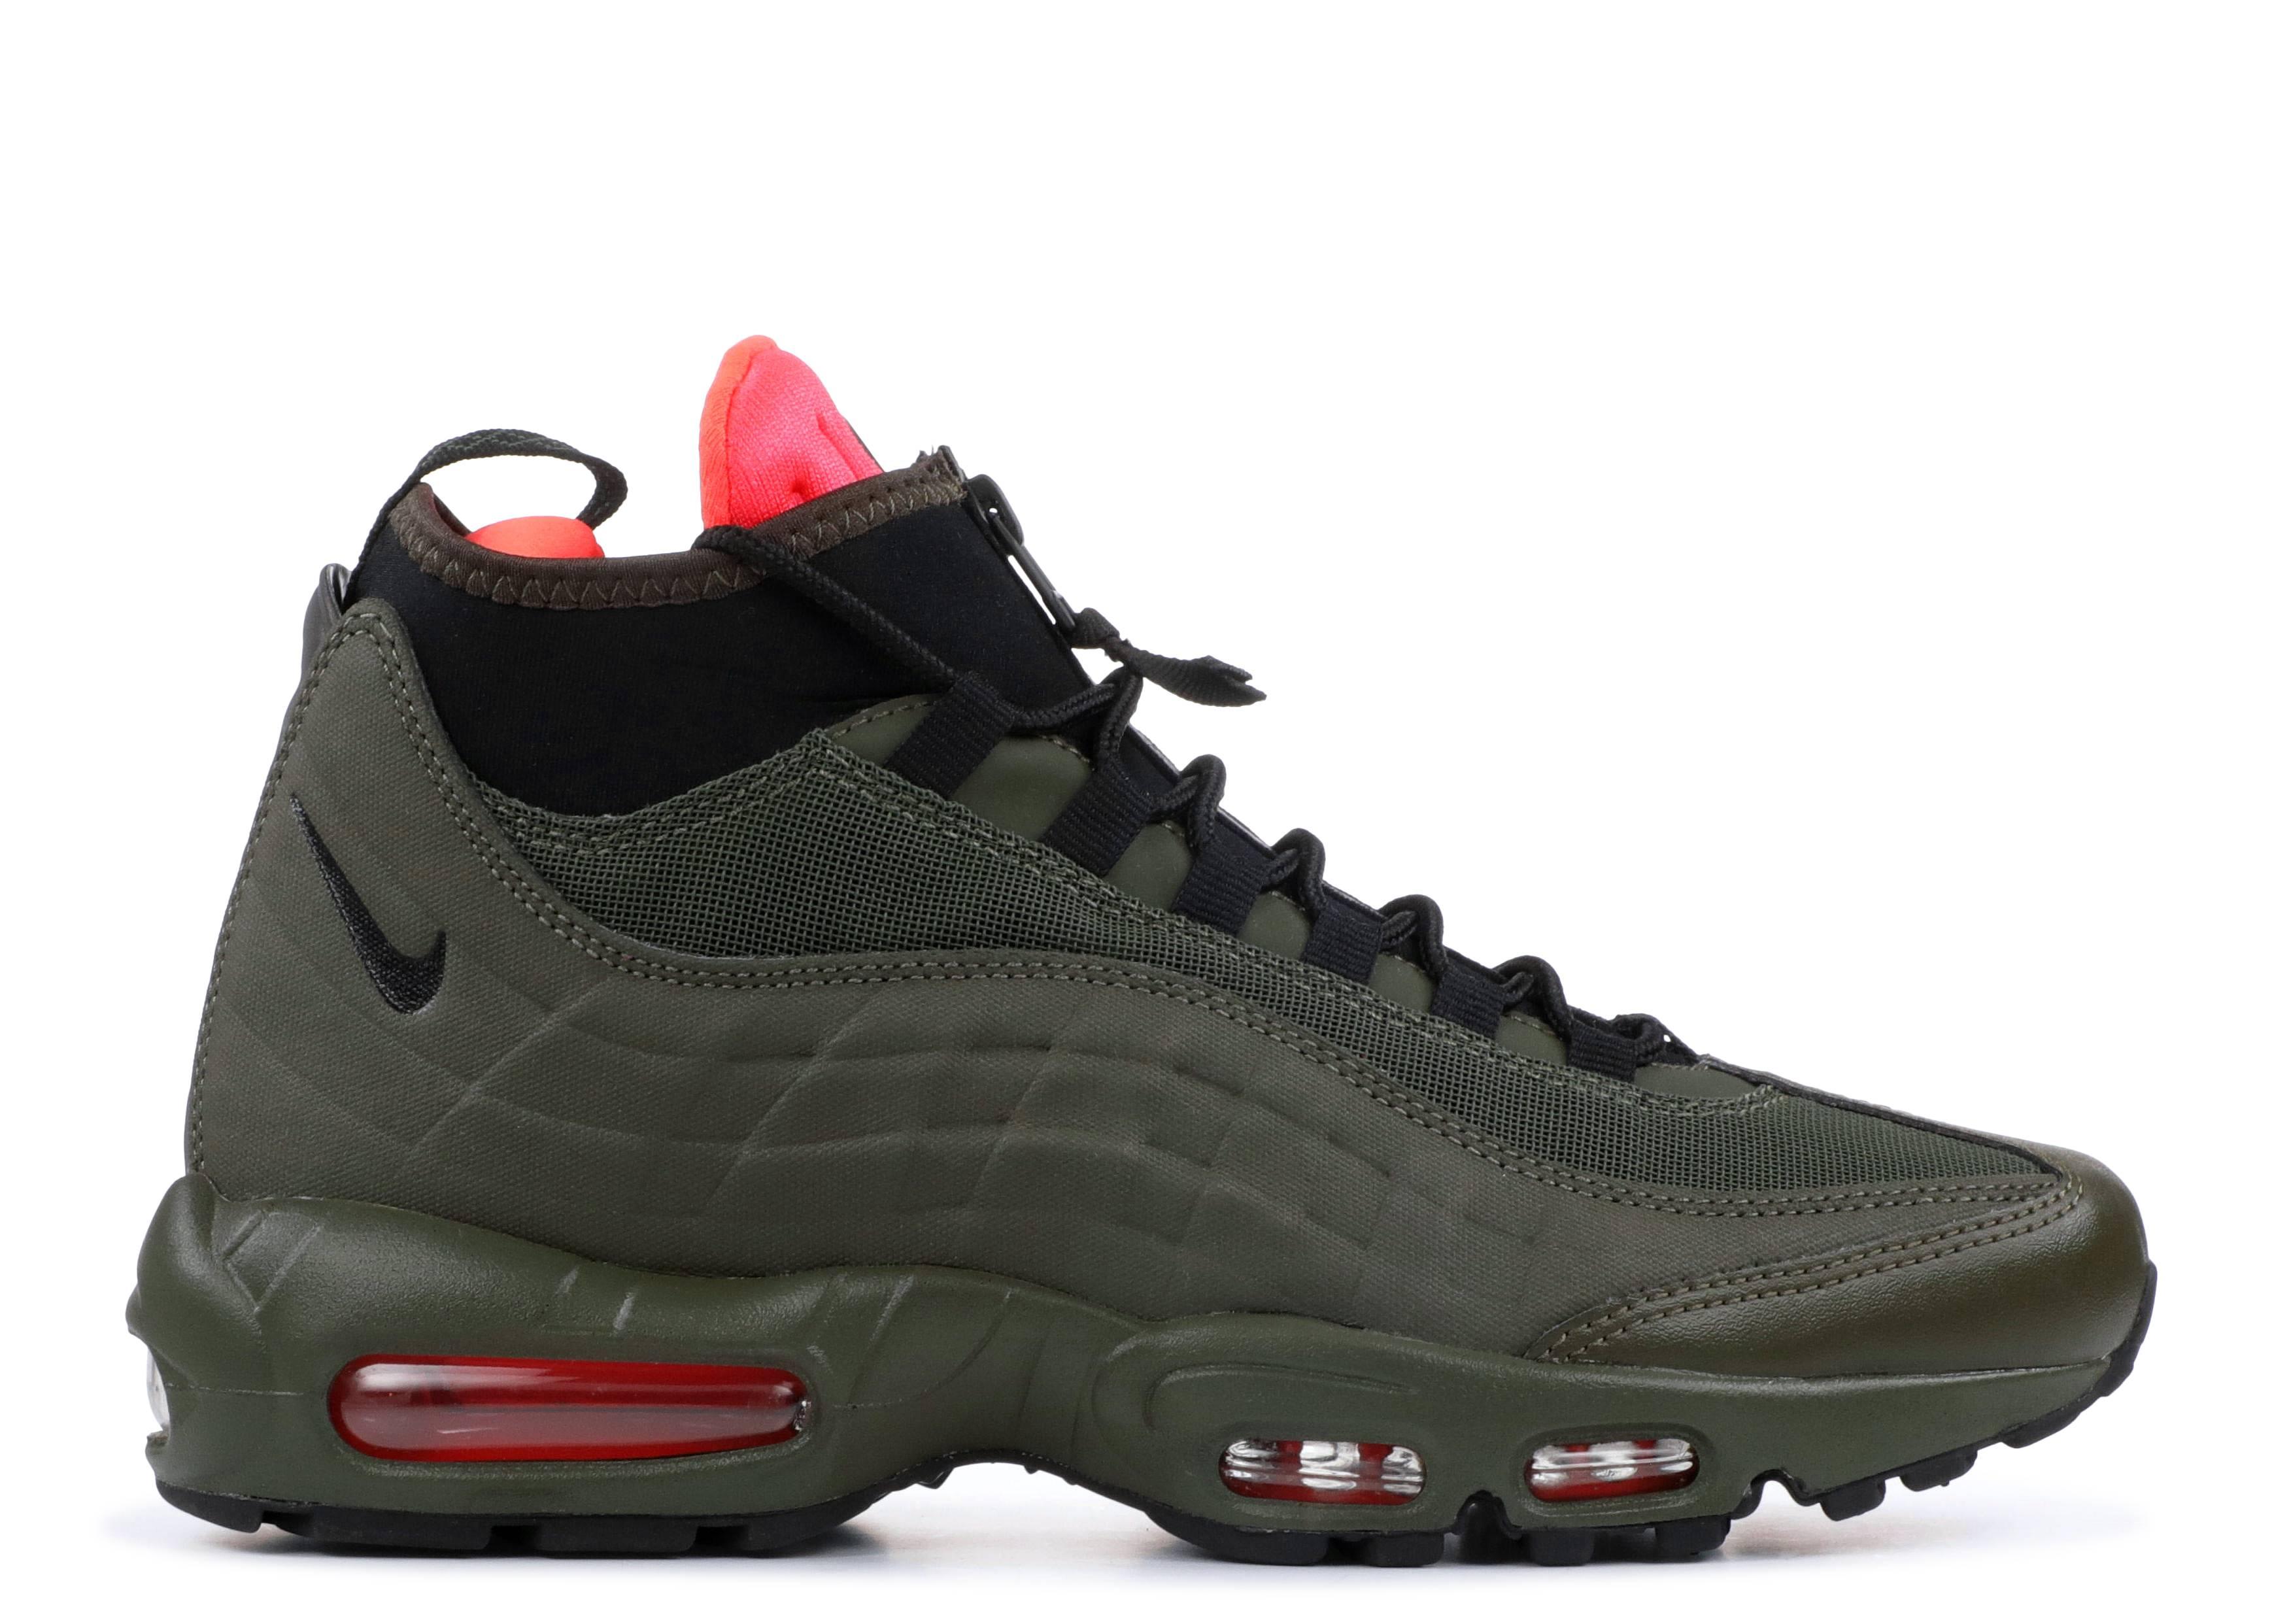 huge discount f2e5f 9b957 Nike Air Max 95 Sneakerboot - Nike - 806809 300 - dark loden black-cargo  khaki   Flight Club